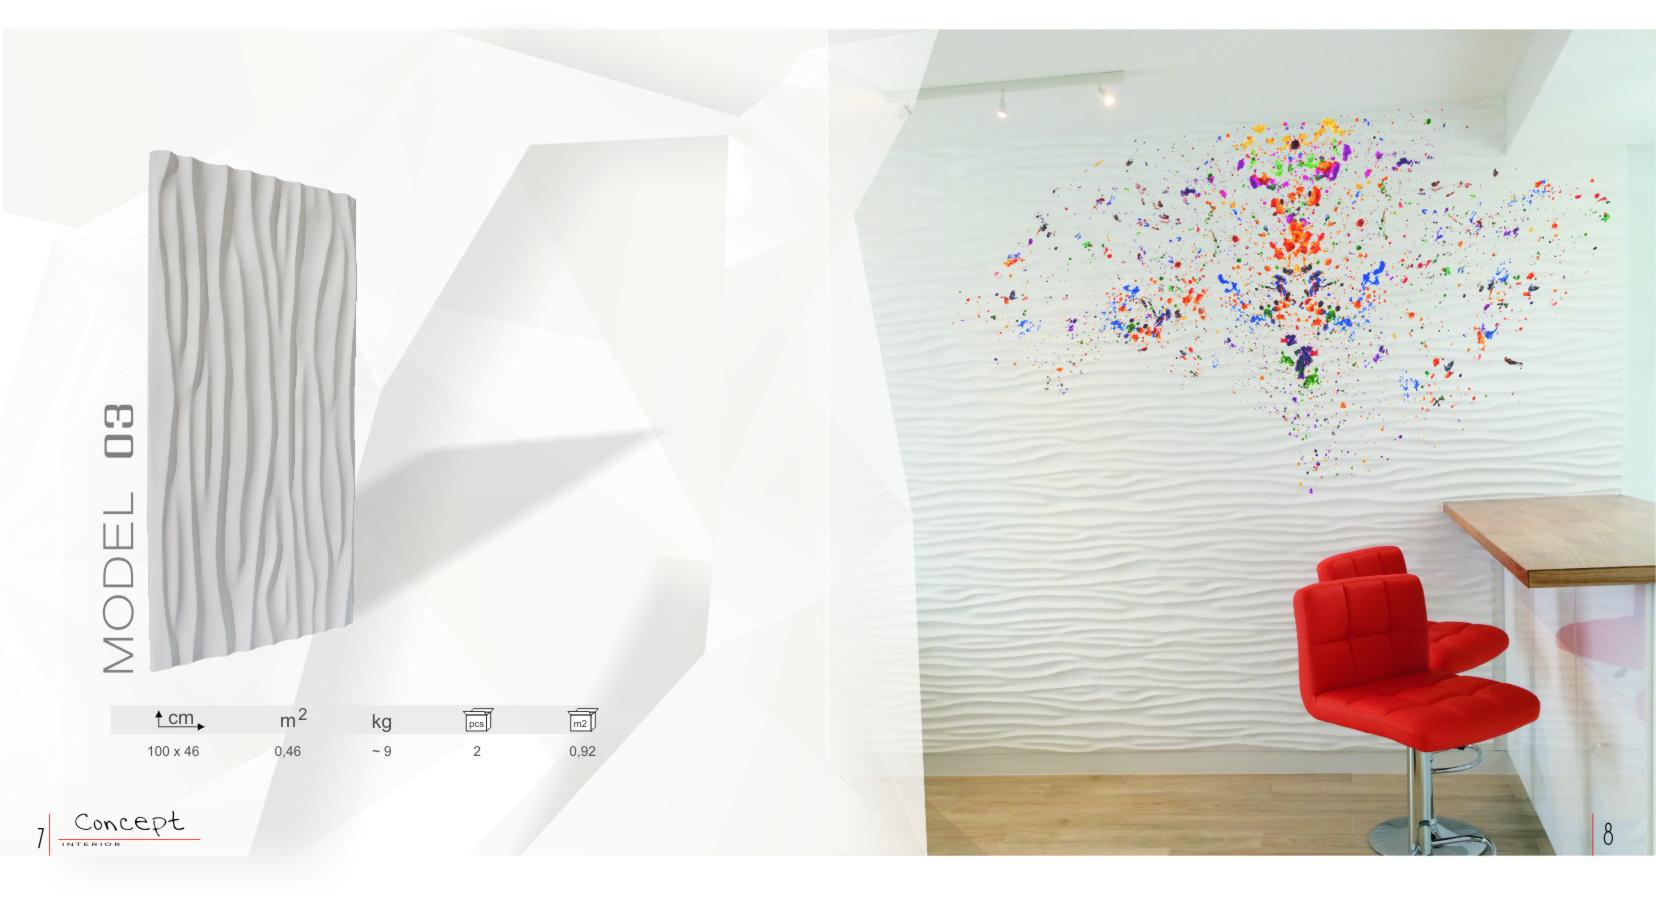 katalog panele gipsowe  Concept str5